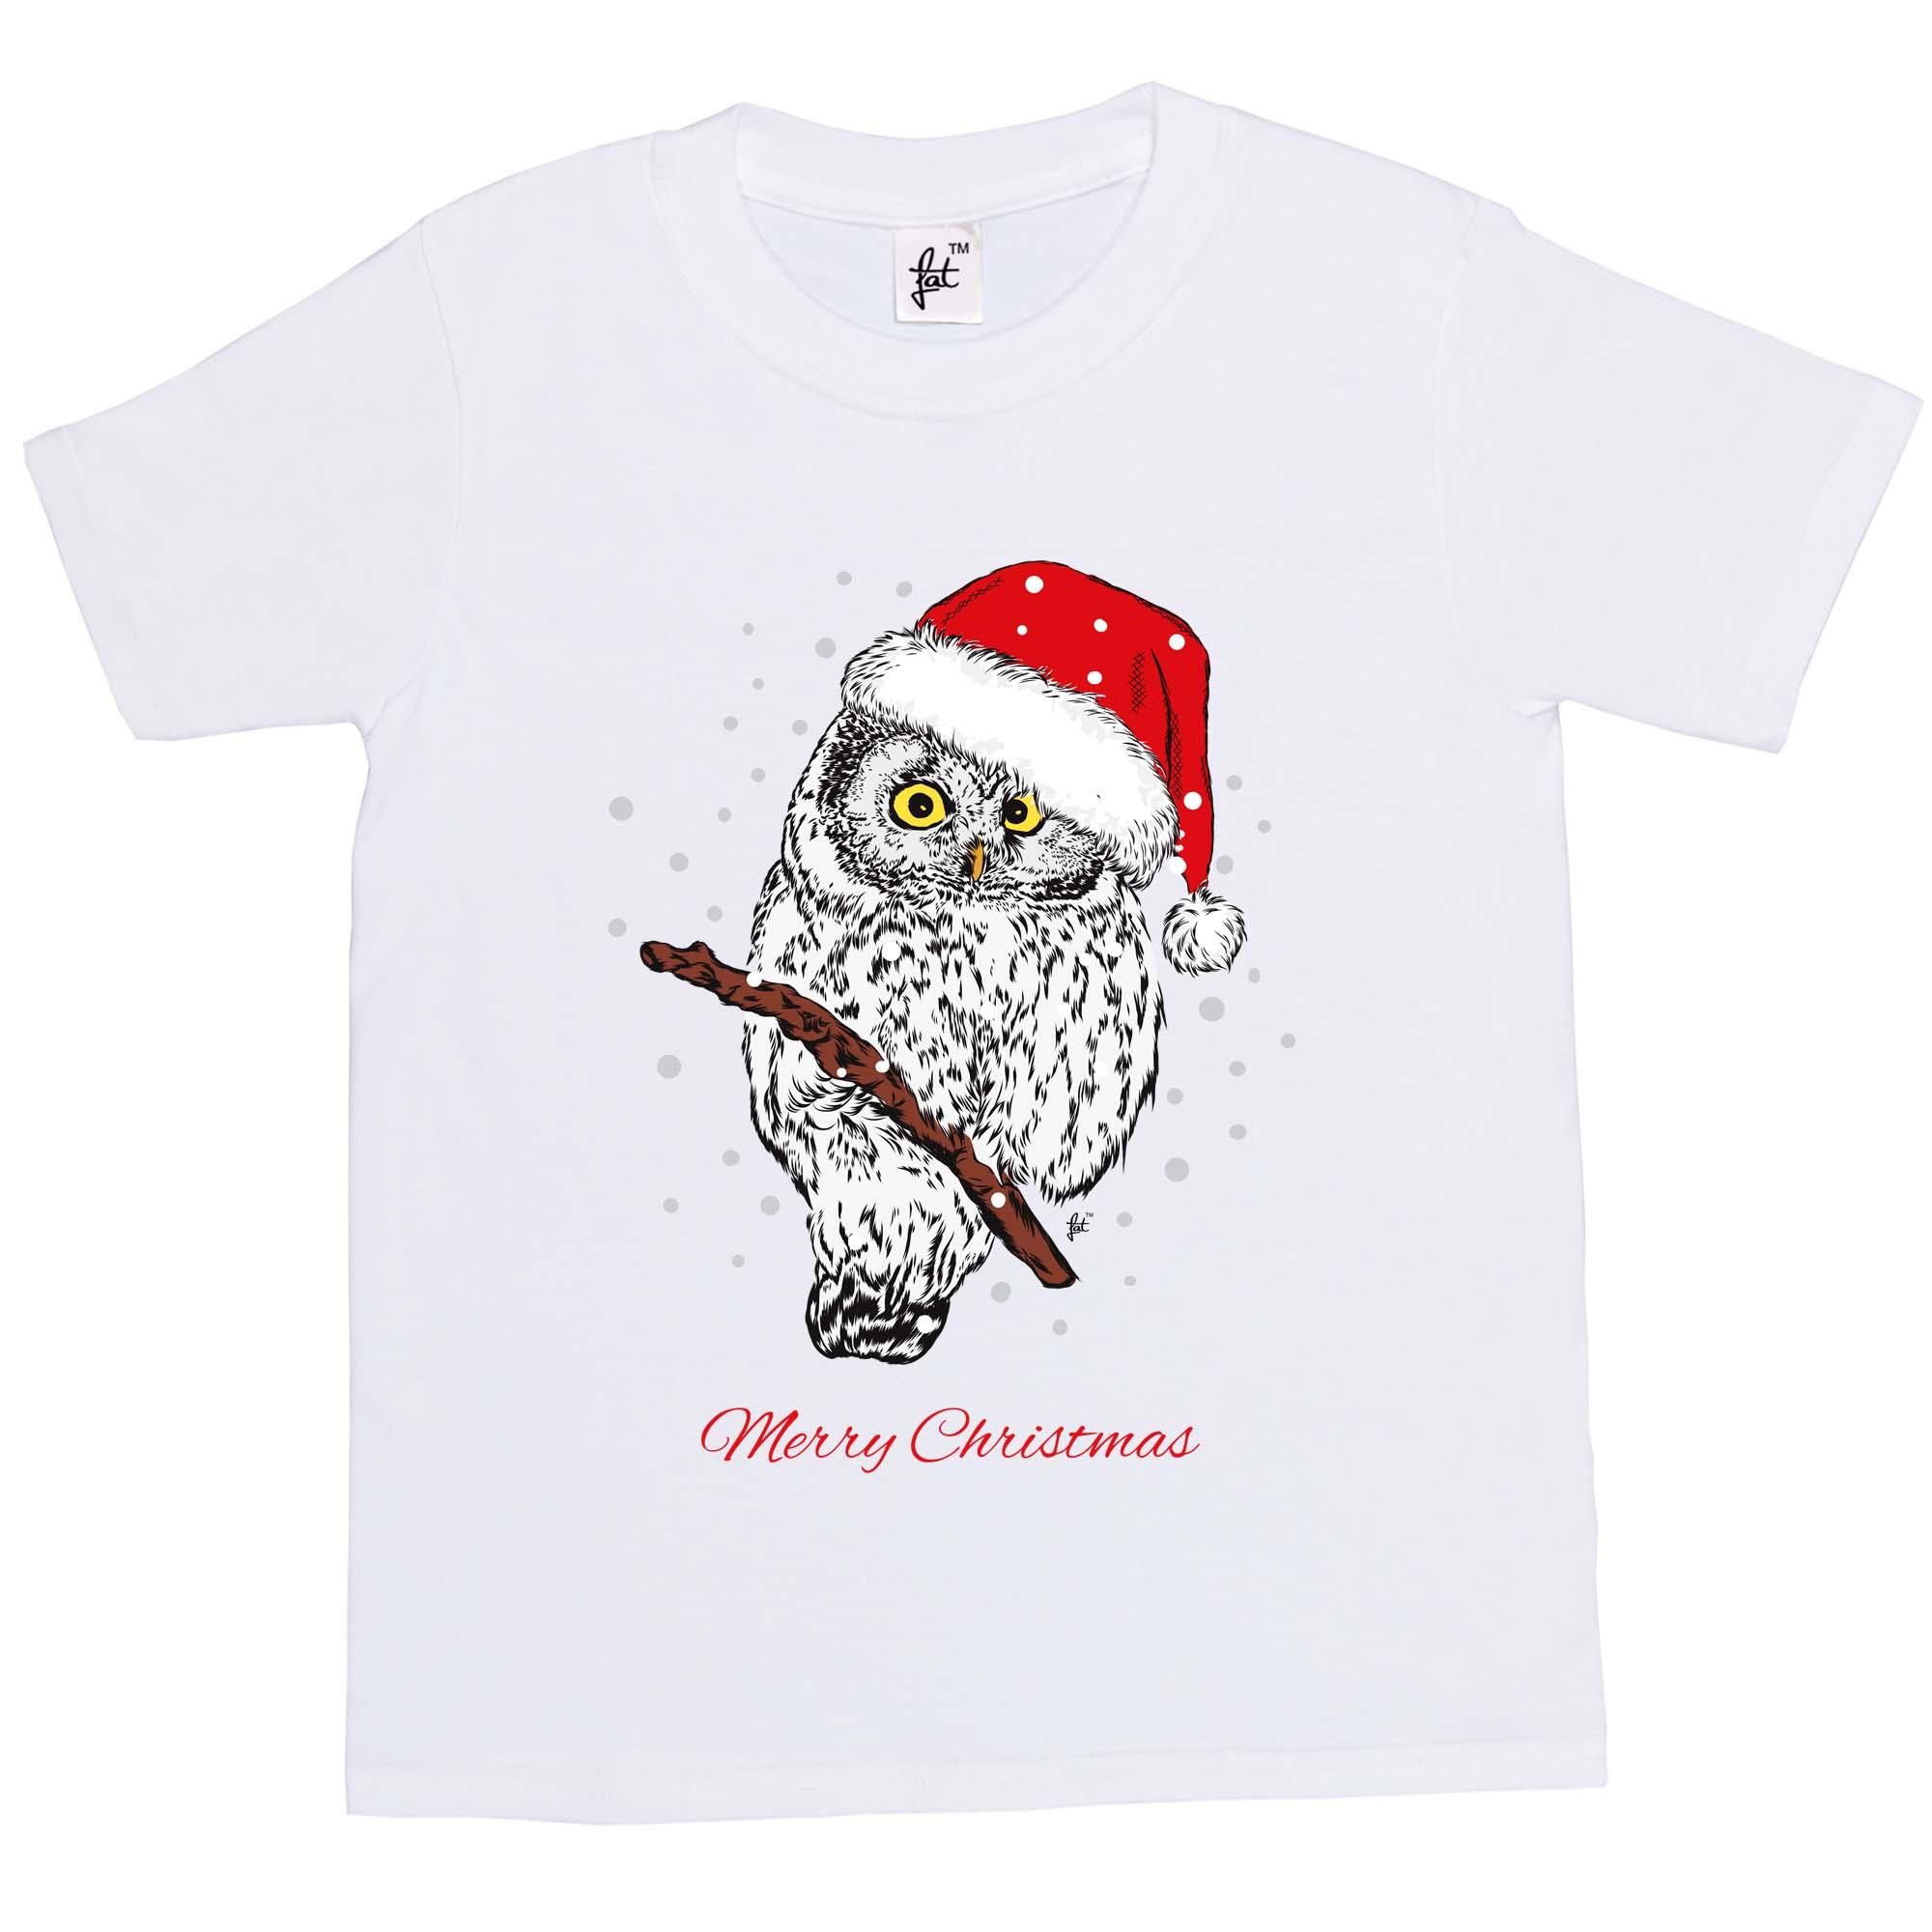 Girls T-Shirt Christmas Owl Wearing Santa Hat Sat In Tree Snowing Kids Boys